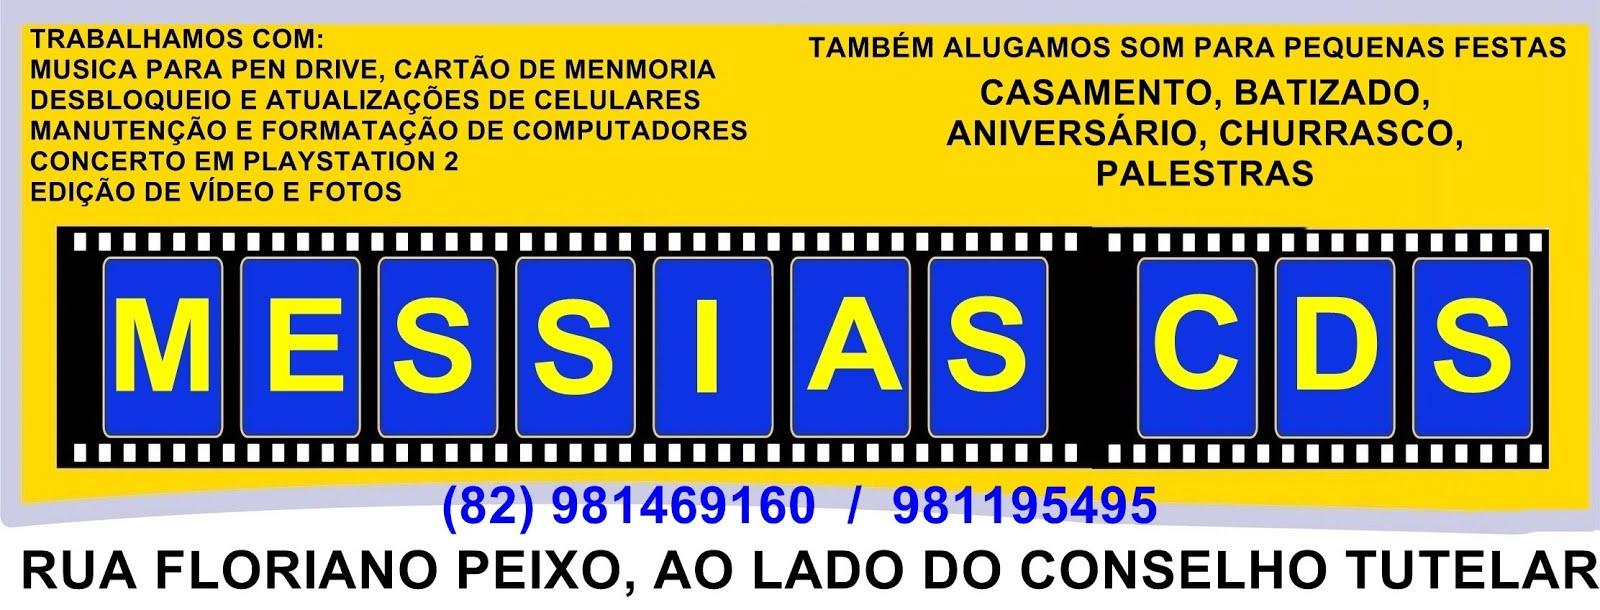 (82) 981469160  /  981195495